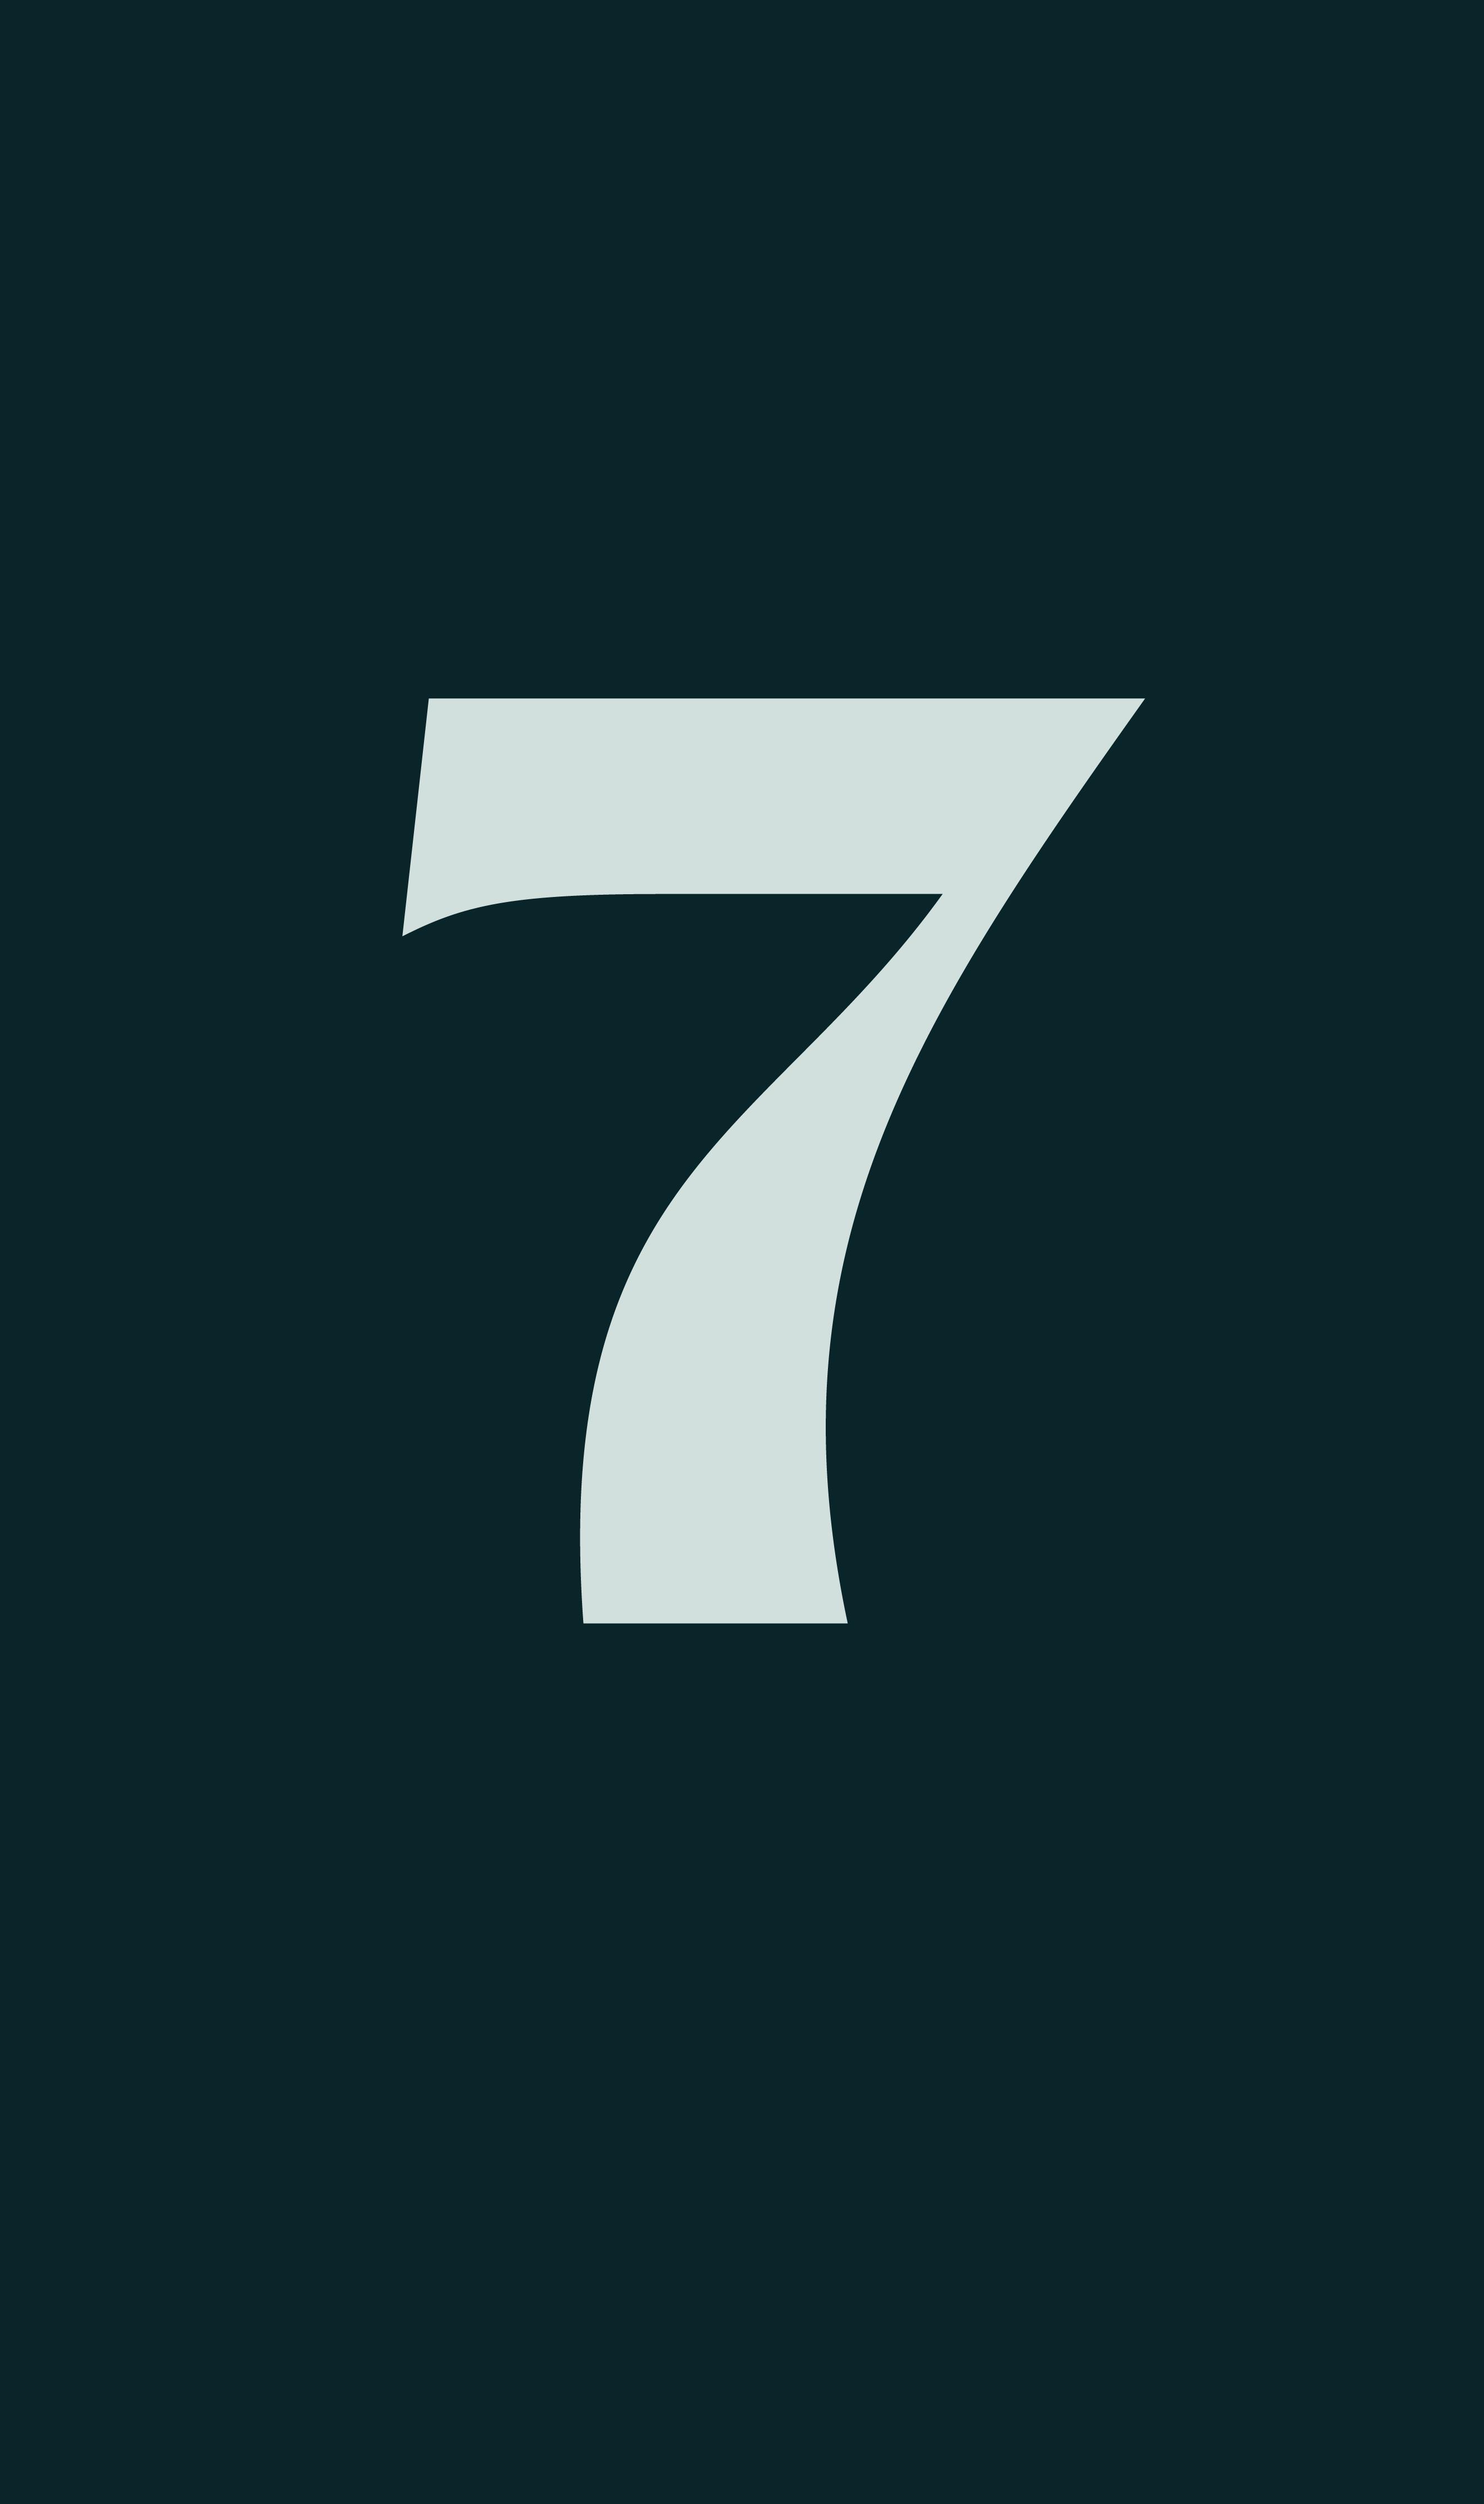 7-tall_skilleark-07